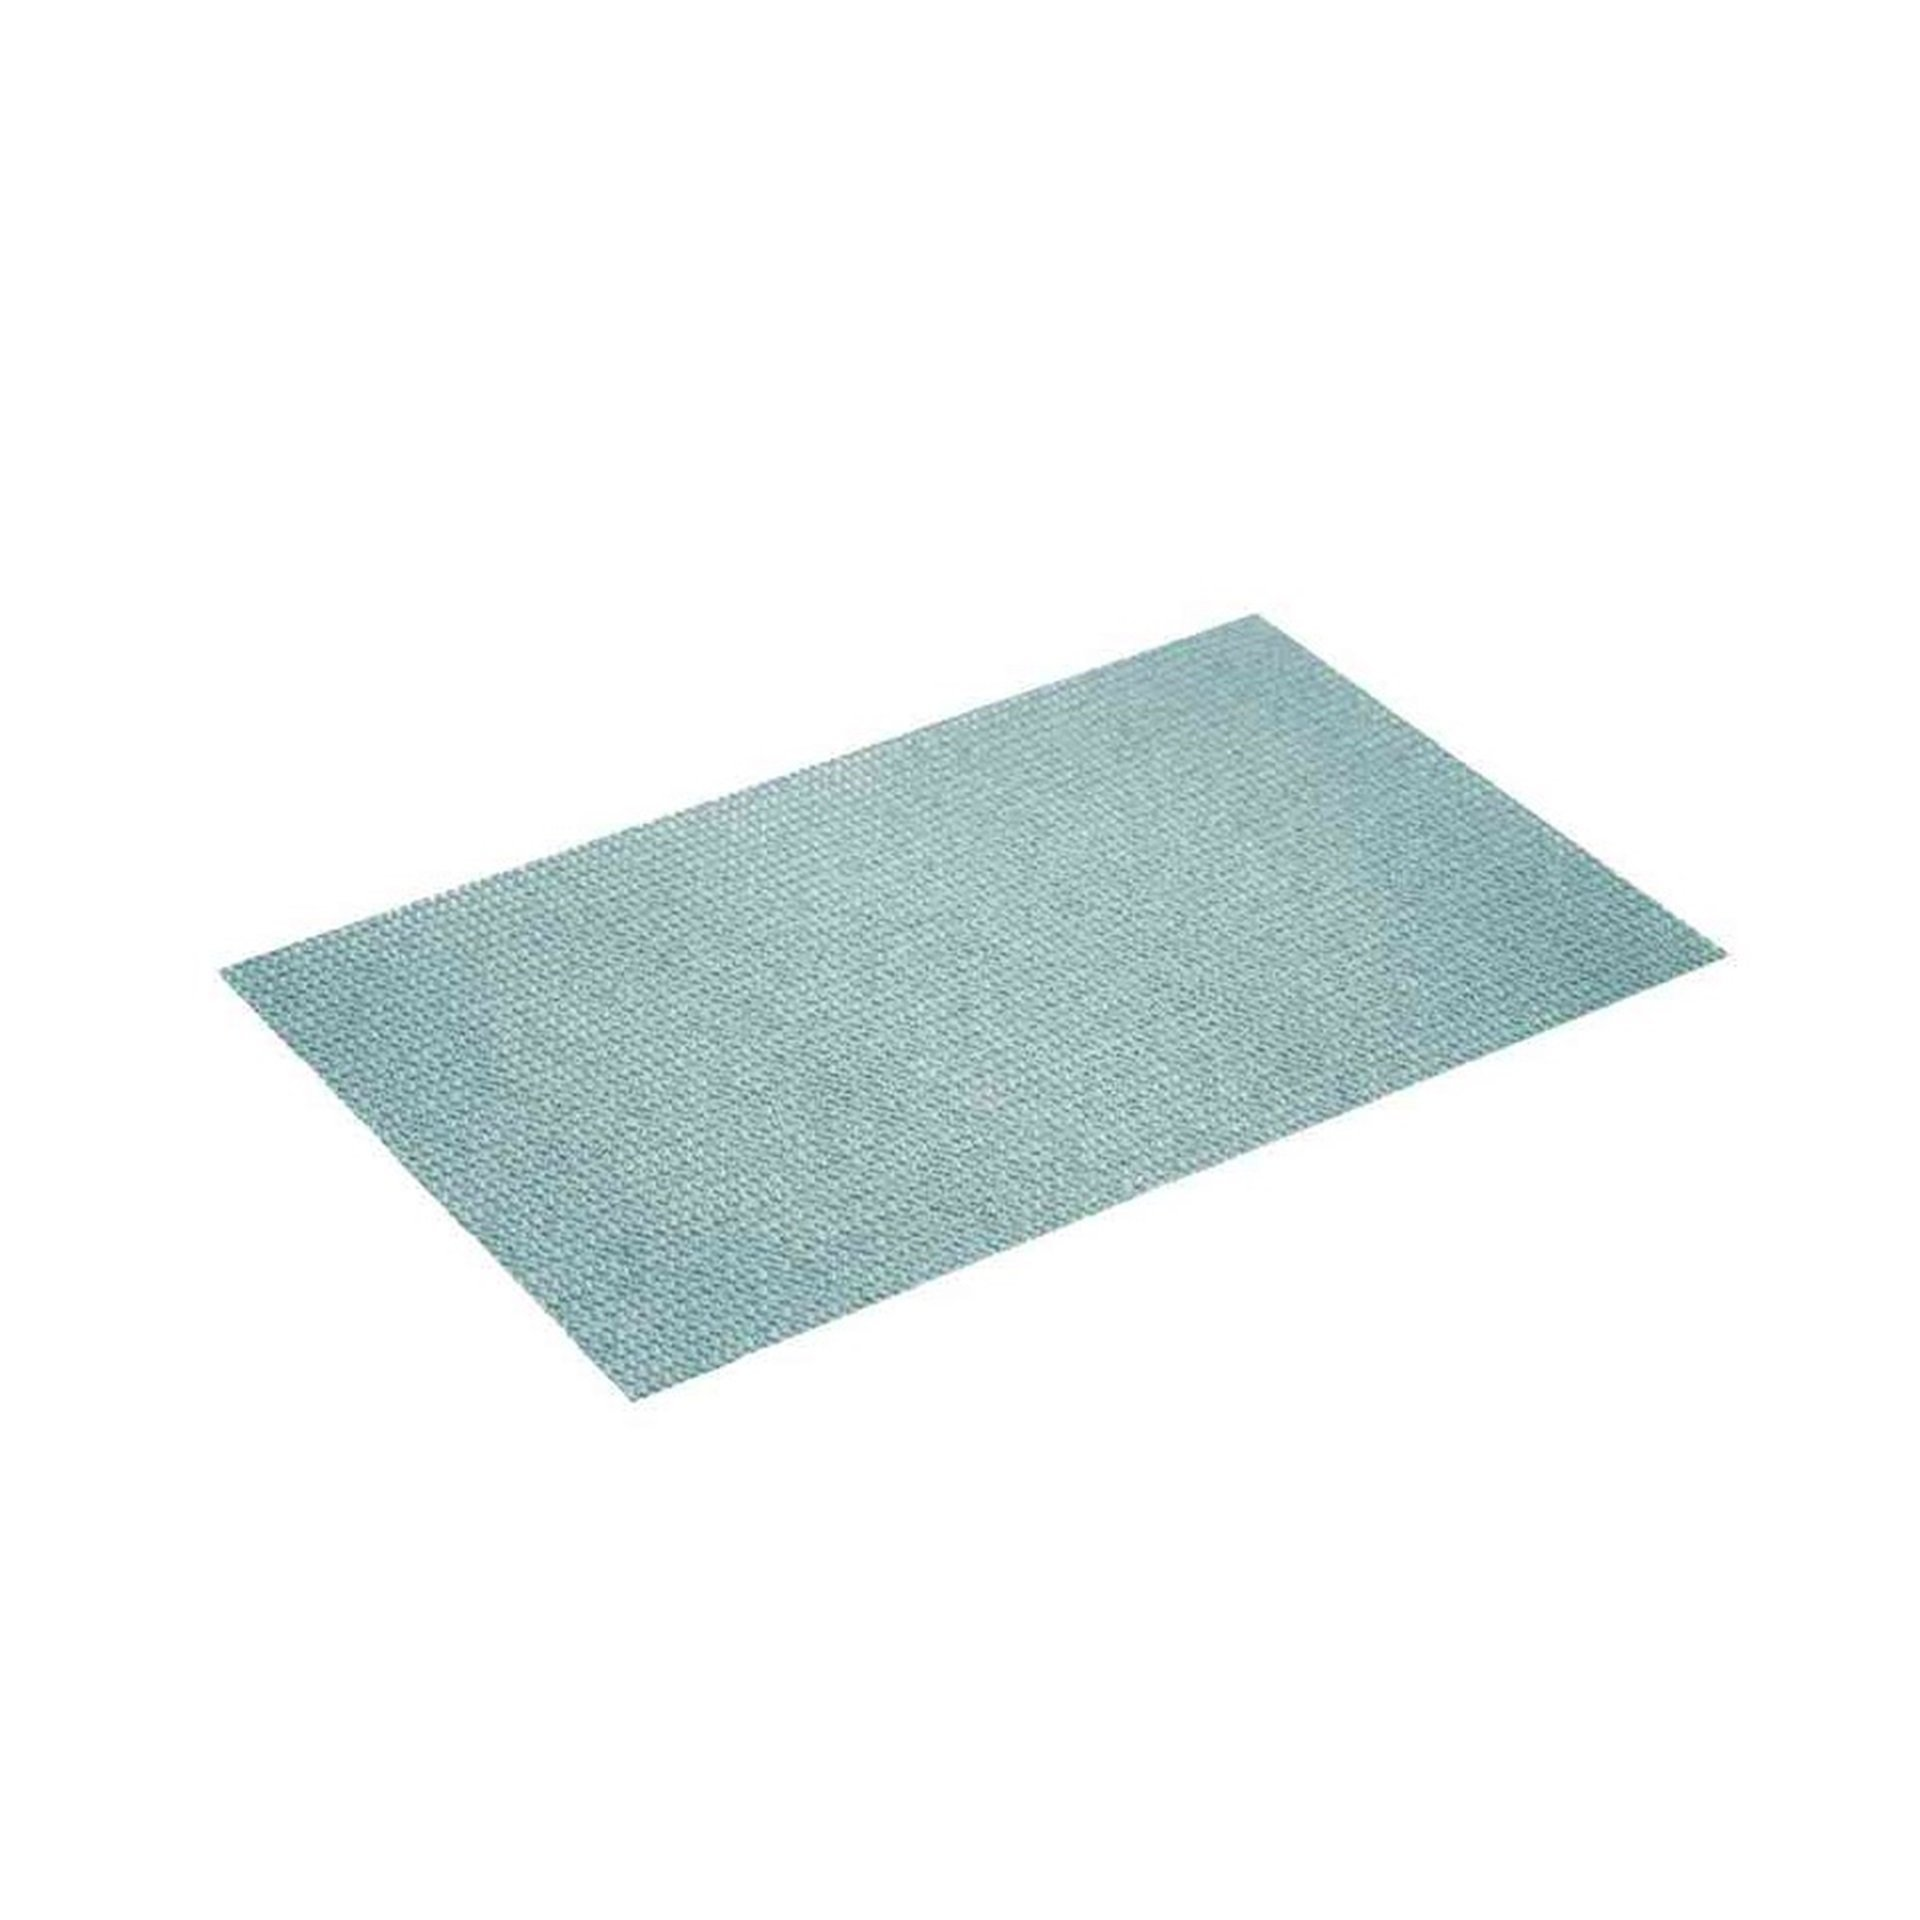 Image of Festool Sanding Pad for Linear Sander LS 130